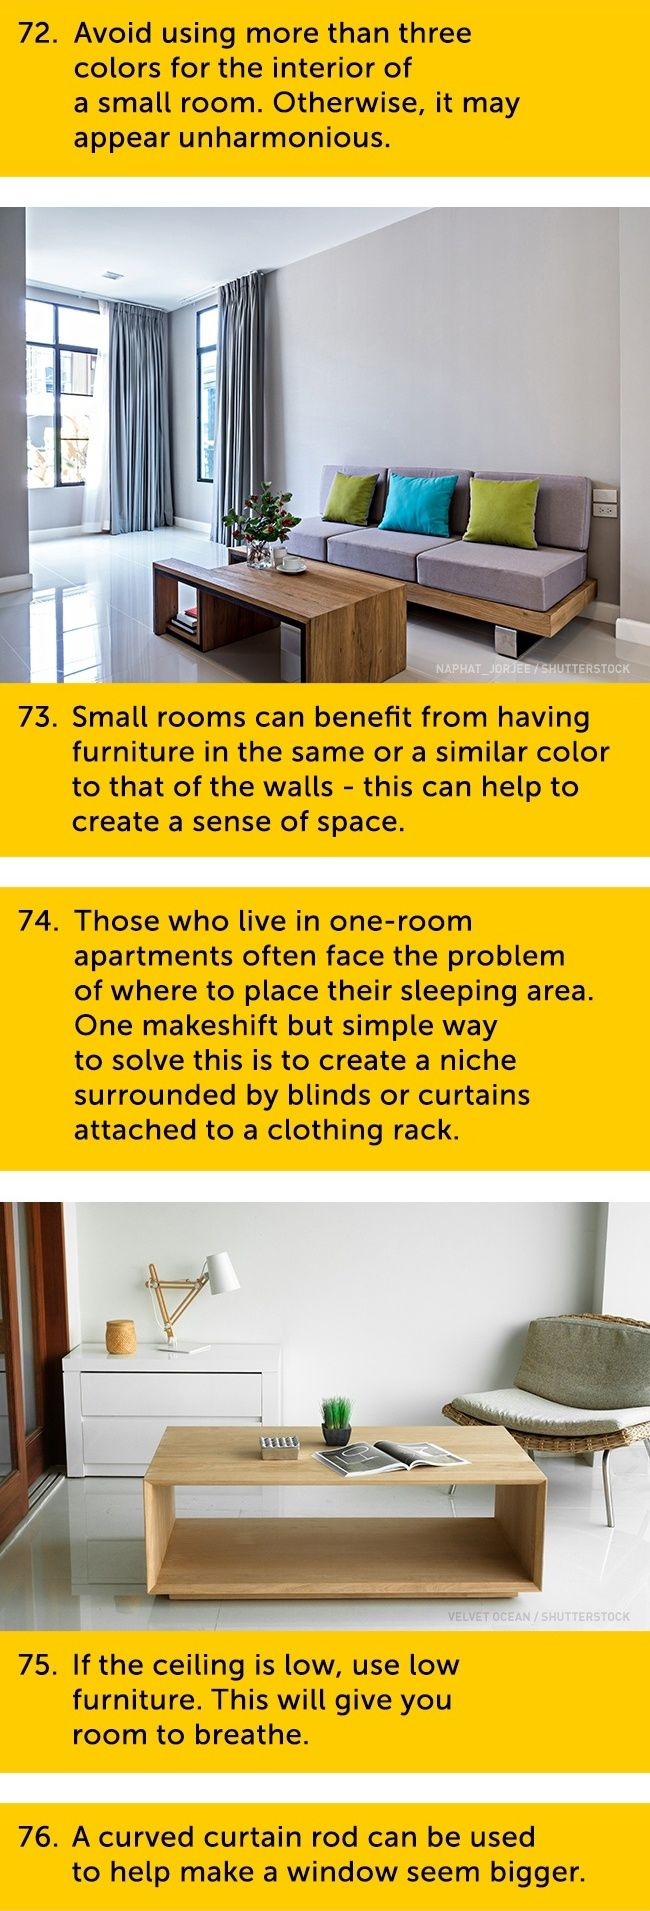 101 Superb Pieces Of Interior Design Advice Interior Design Advice Interior Design Tips Interior Design Bedroom